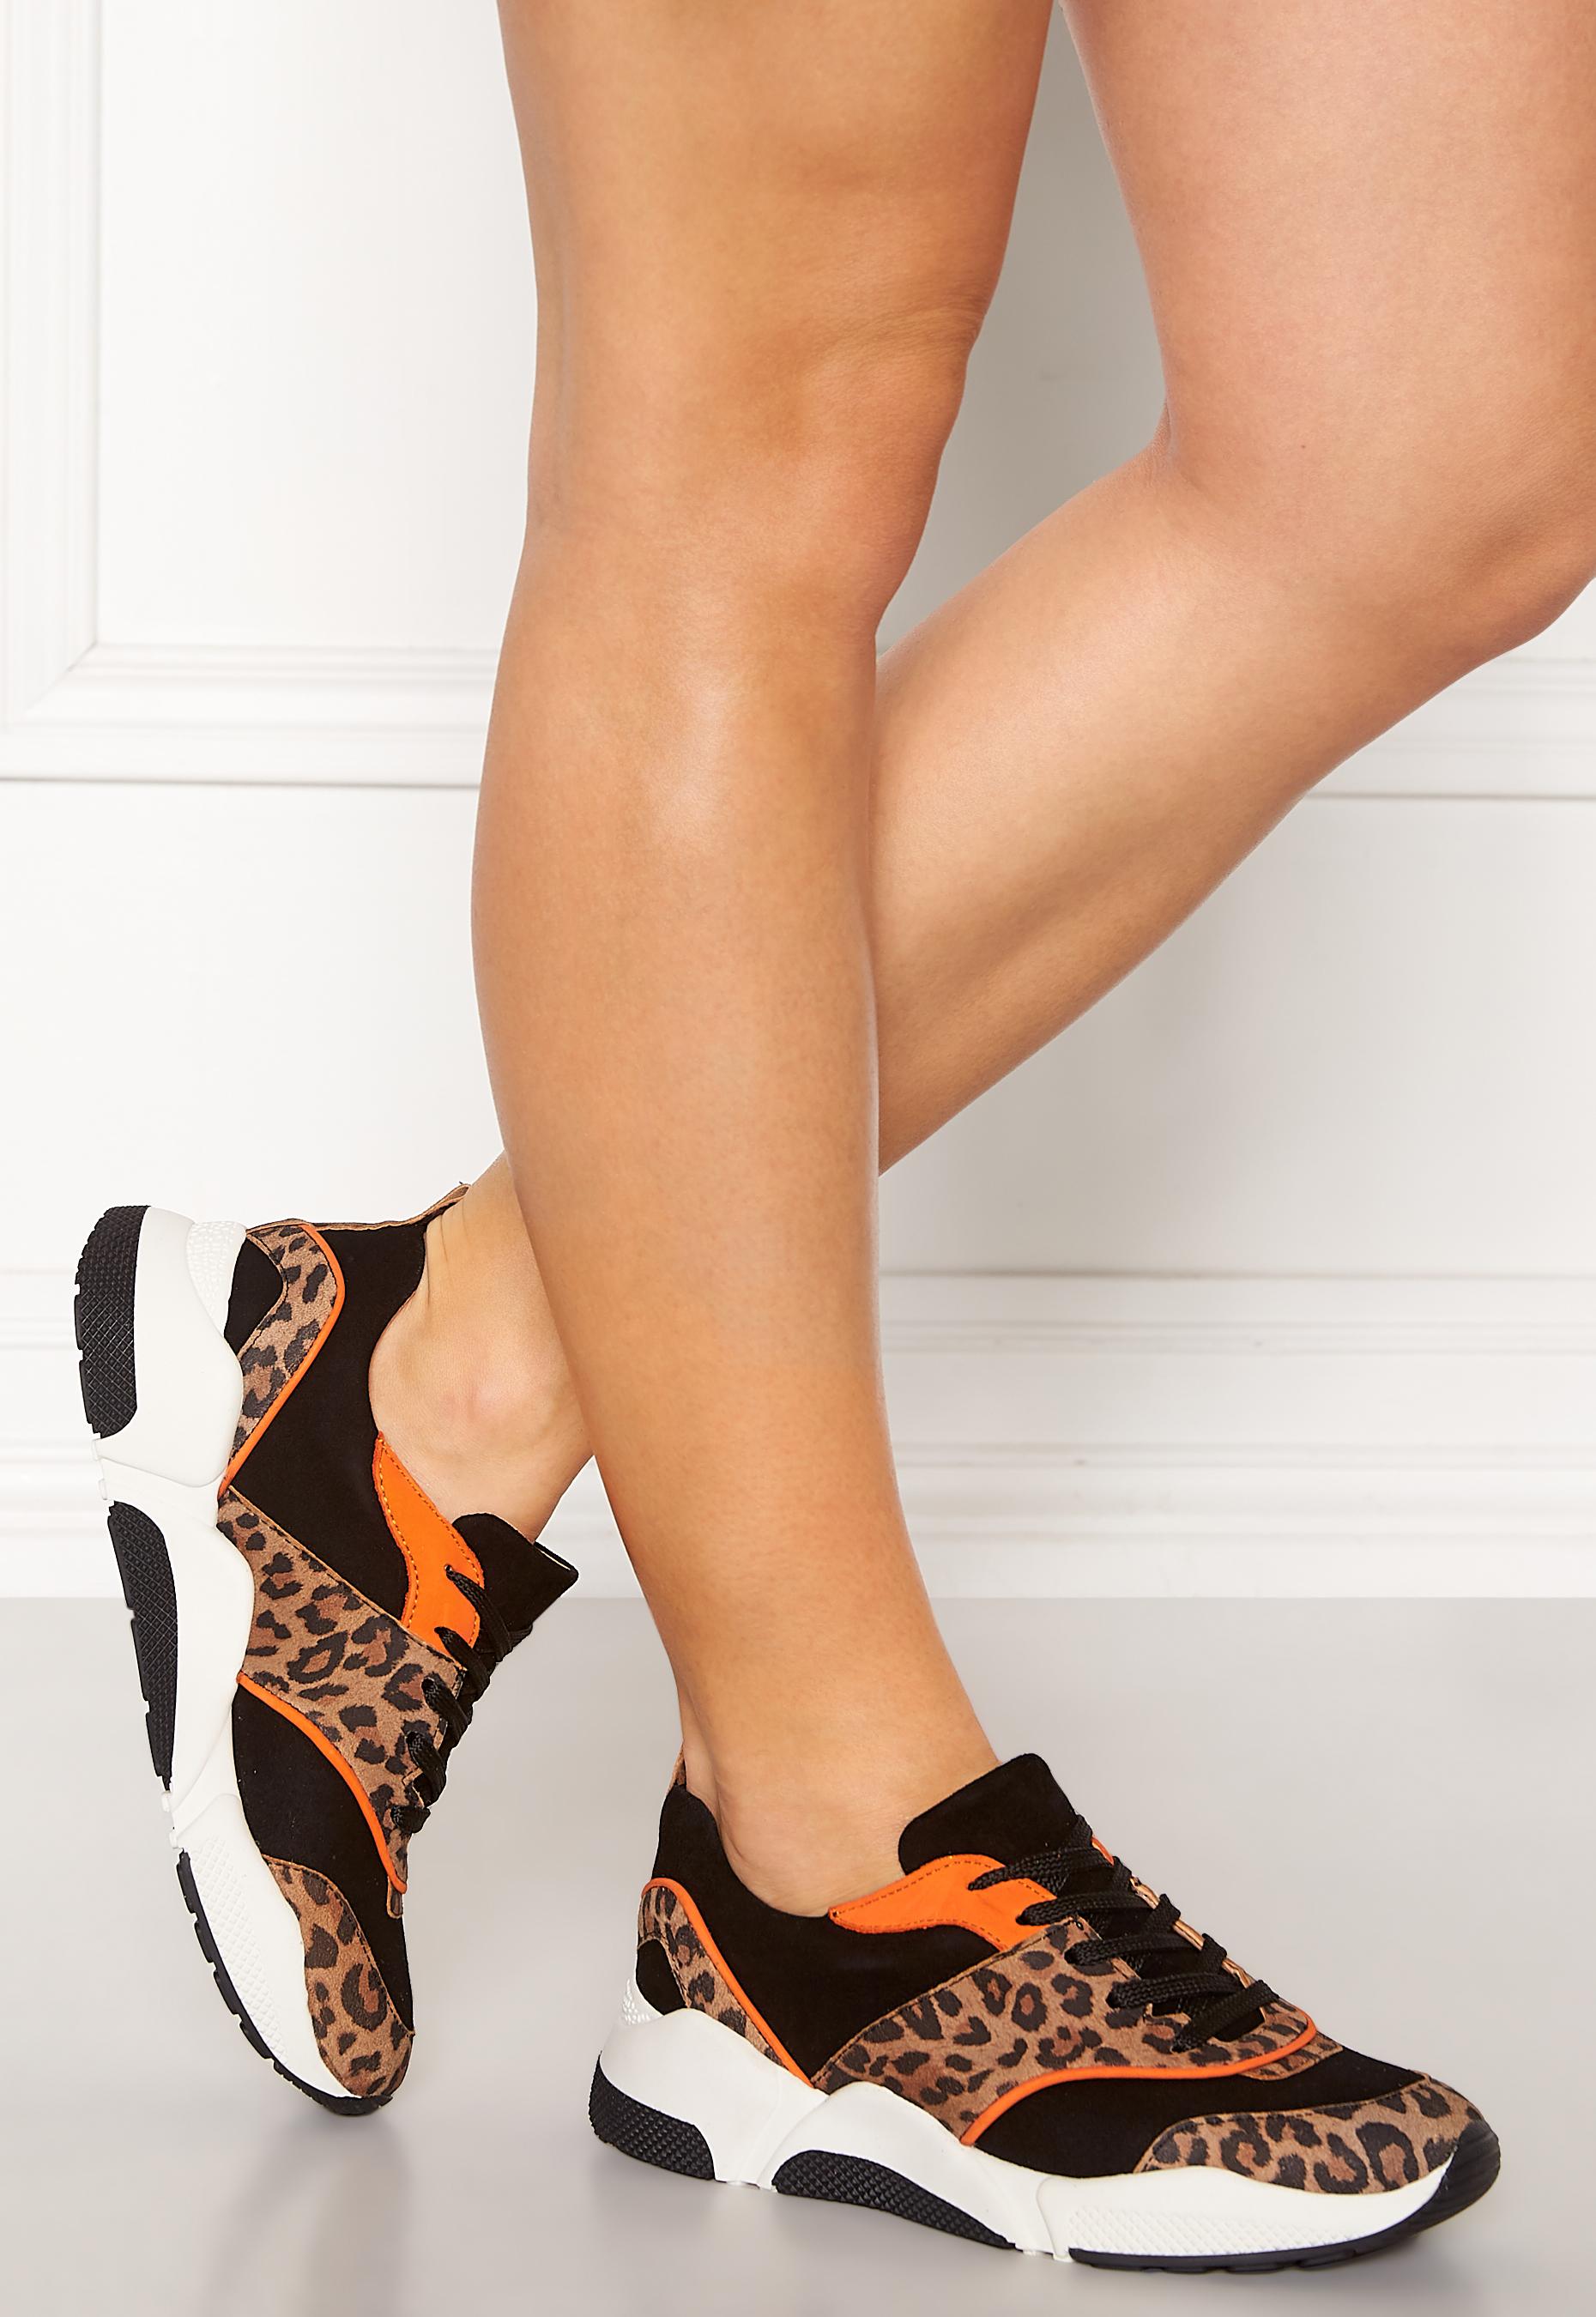 cbcae508a2c Billi Bi Suede Sneakers Leo/Orange - Bubbleroom